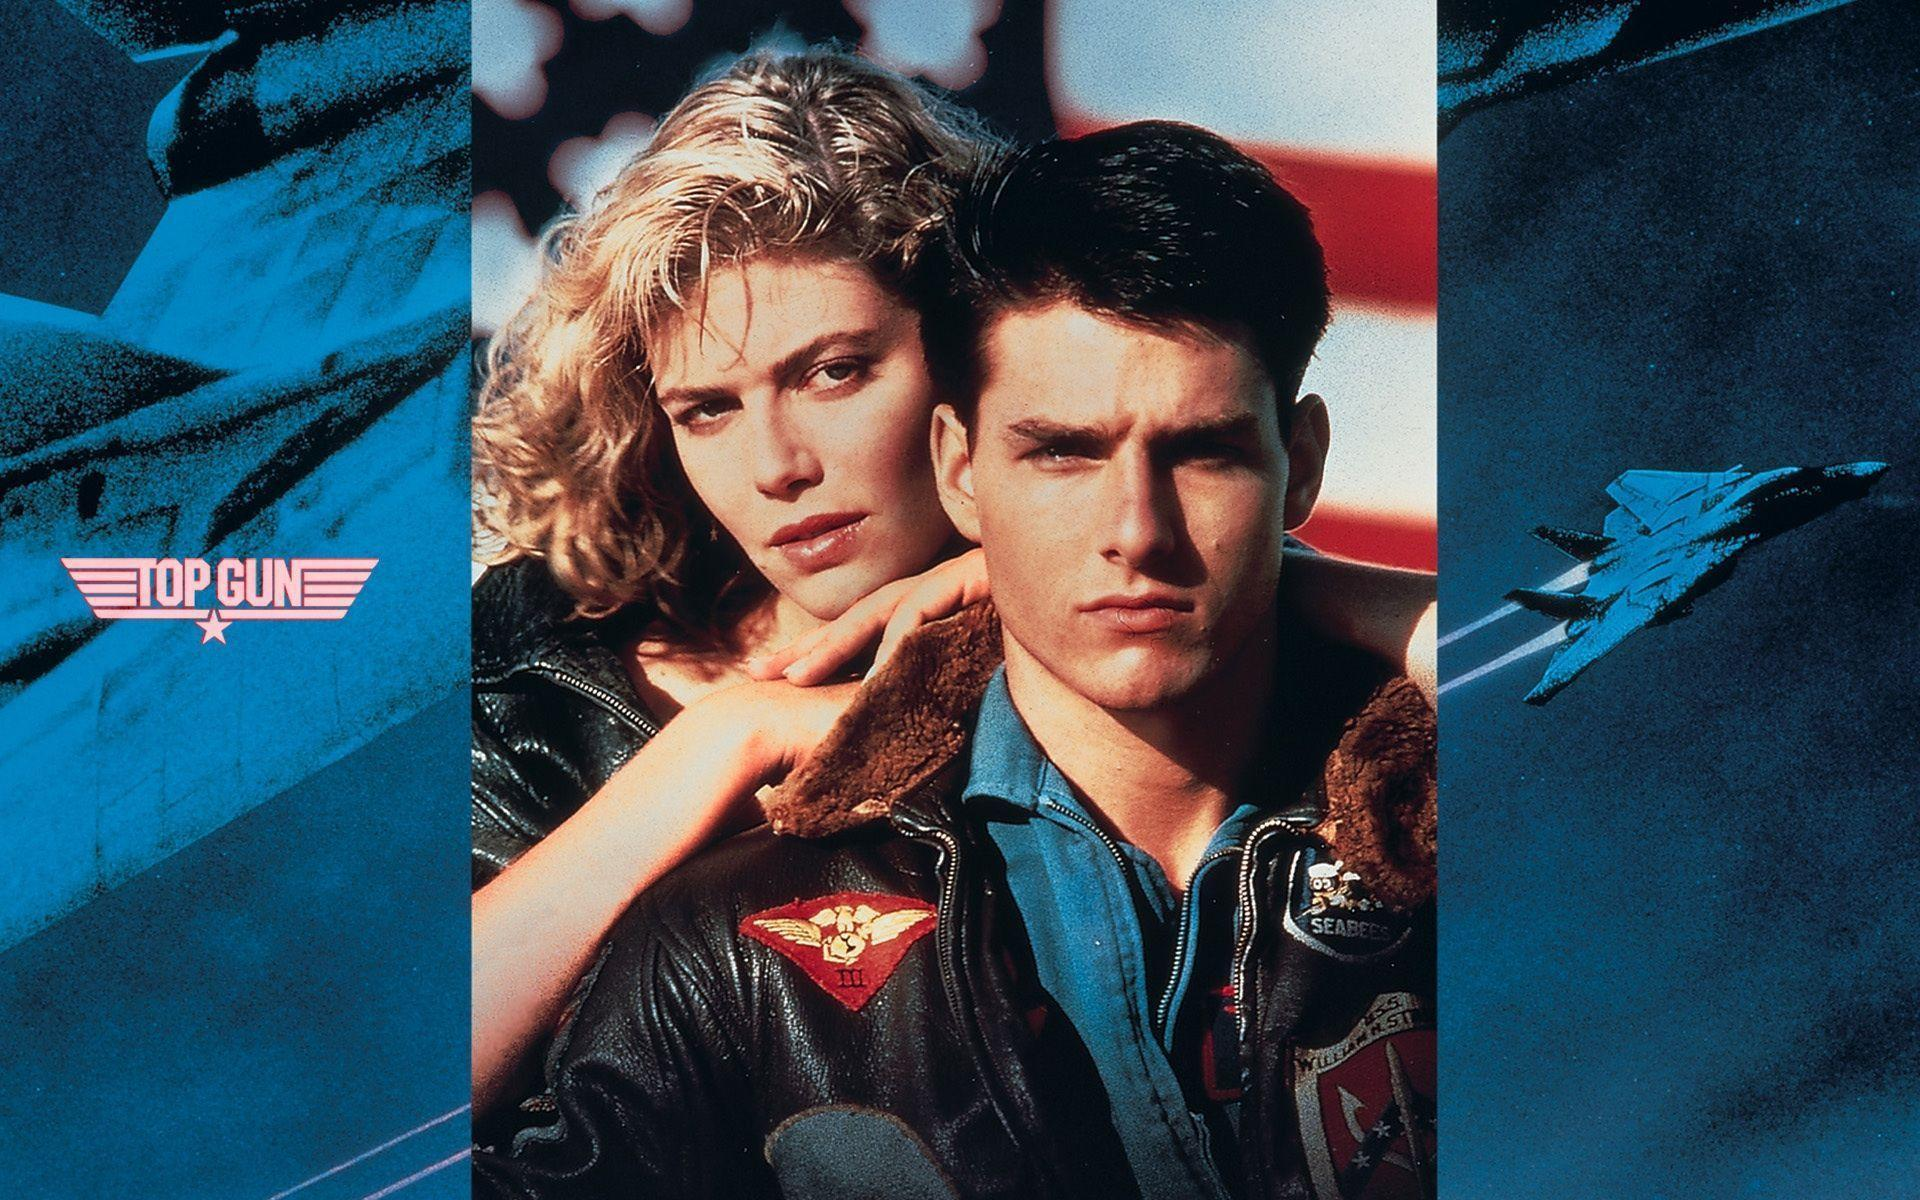 Top Gun Wallpapers, Movie Film | Wallpapers